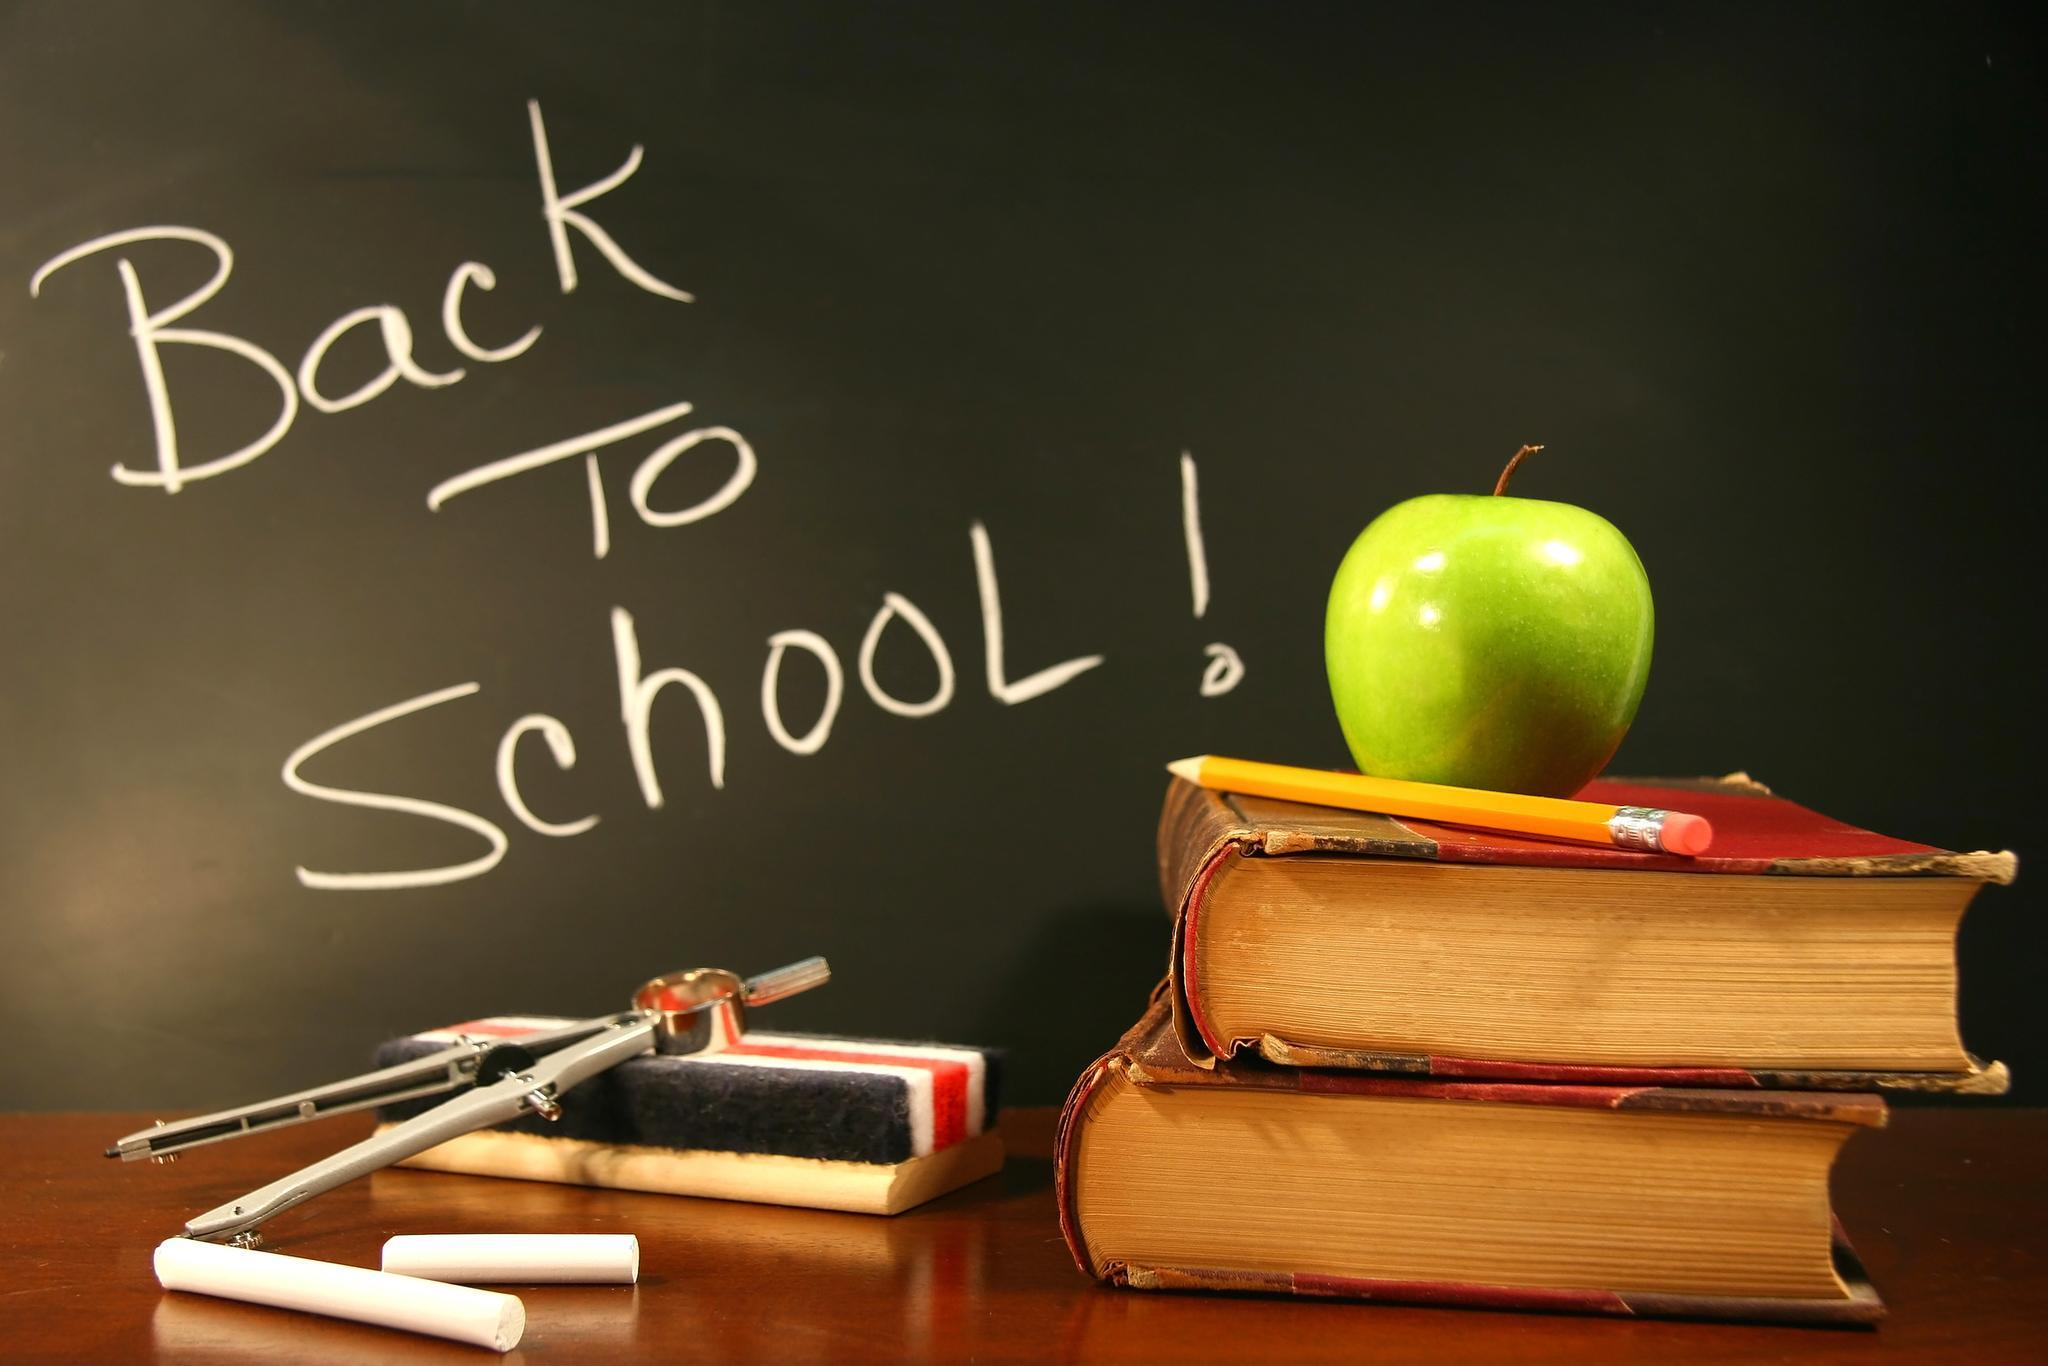 School Supplies Wallpaper Background HD 61718 2442x1718px 2048x1366